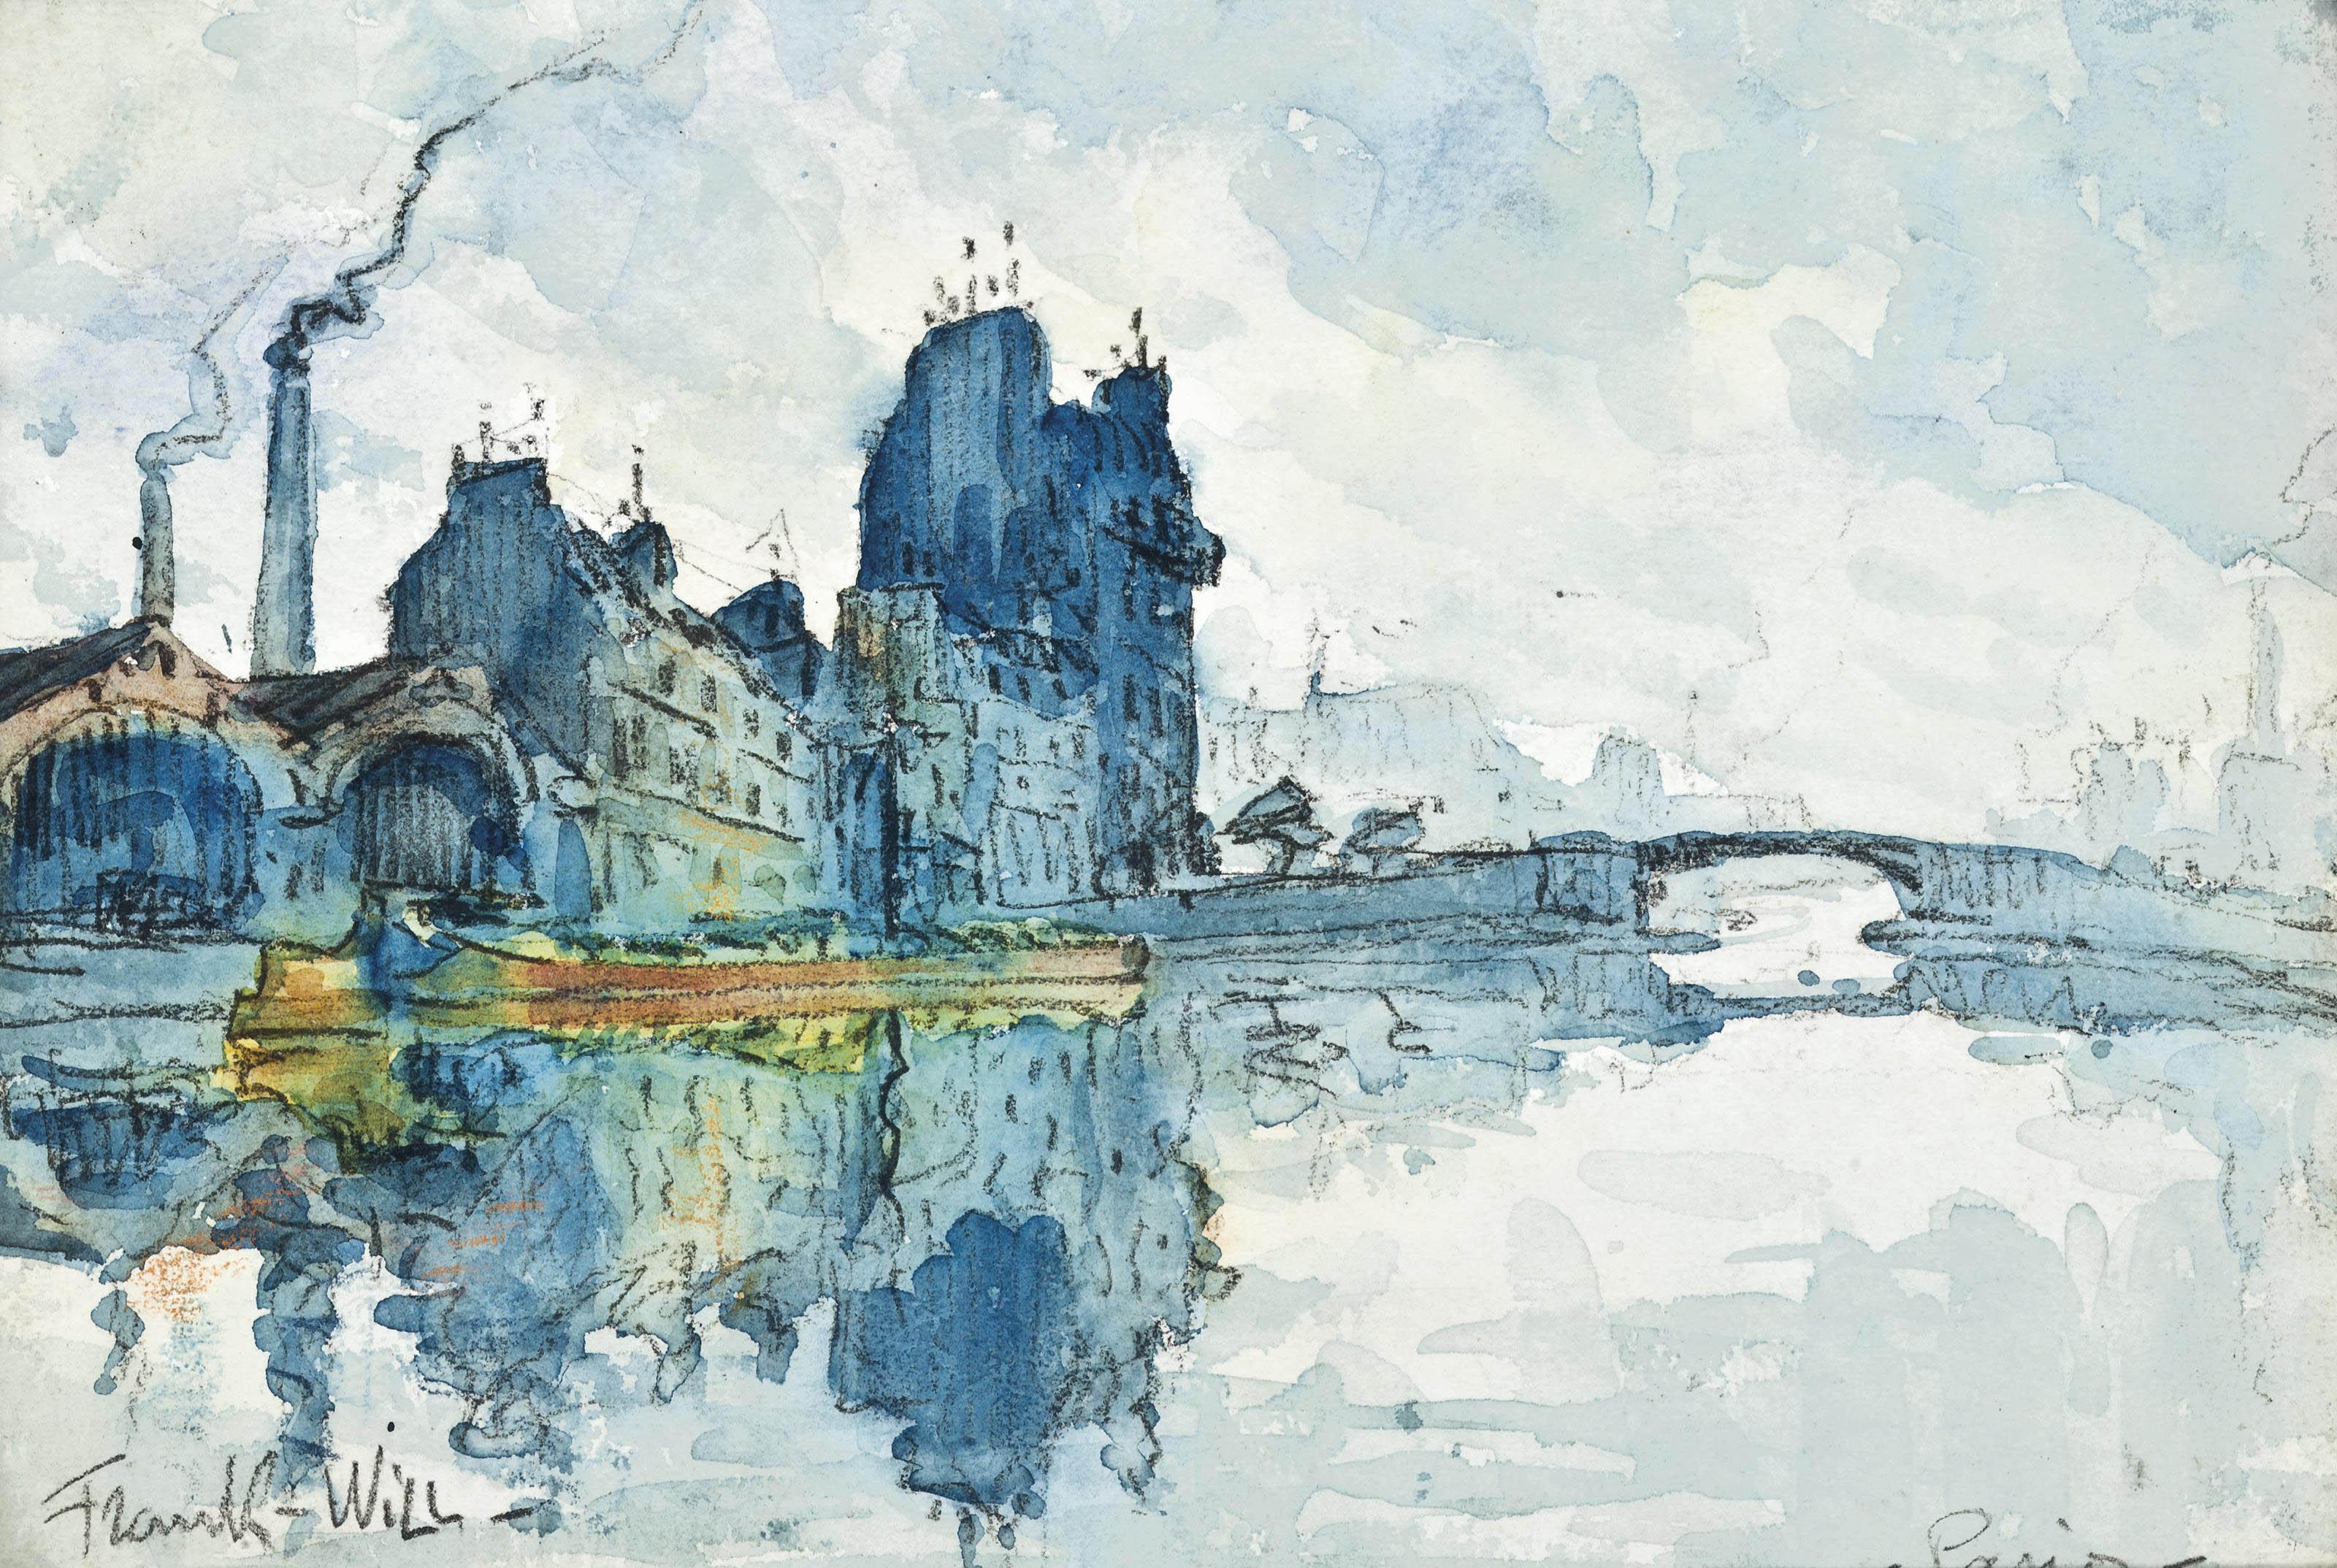 A barge on the Seine, Paris